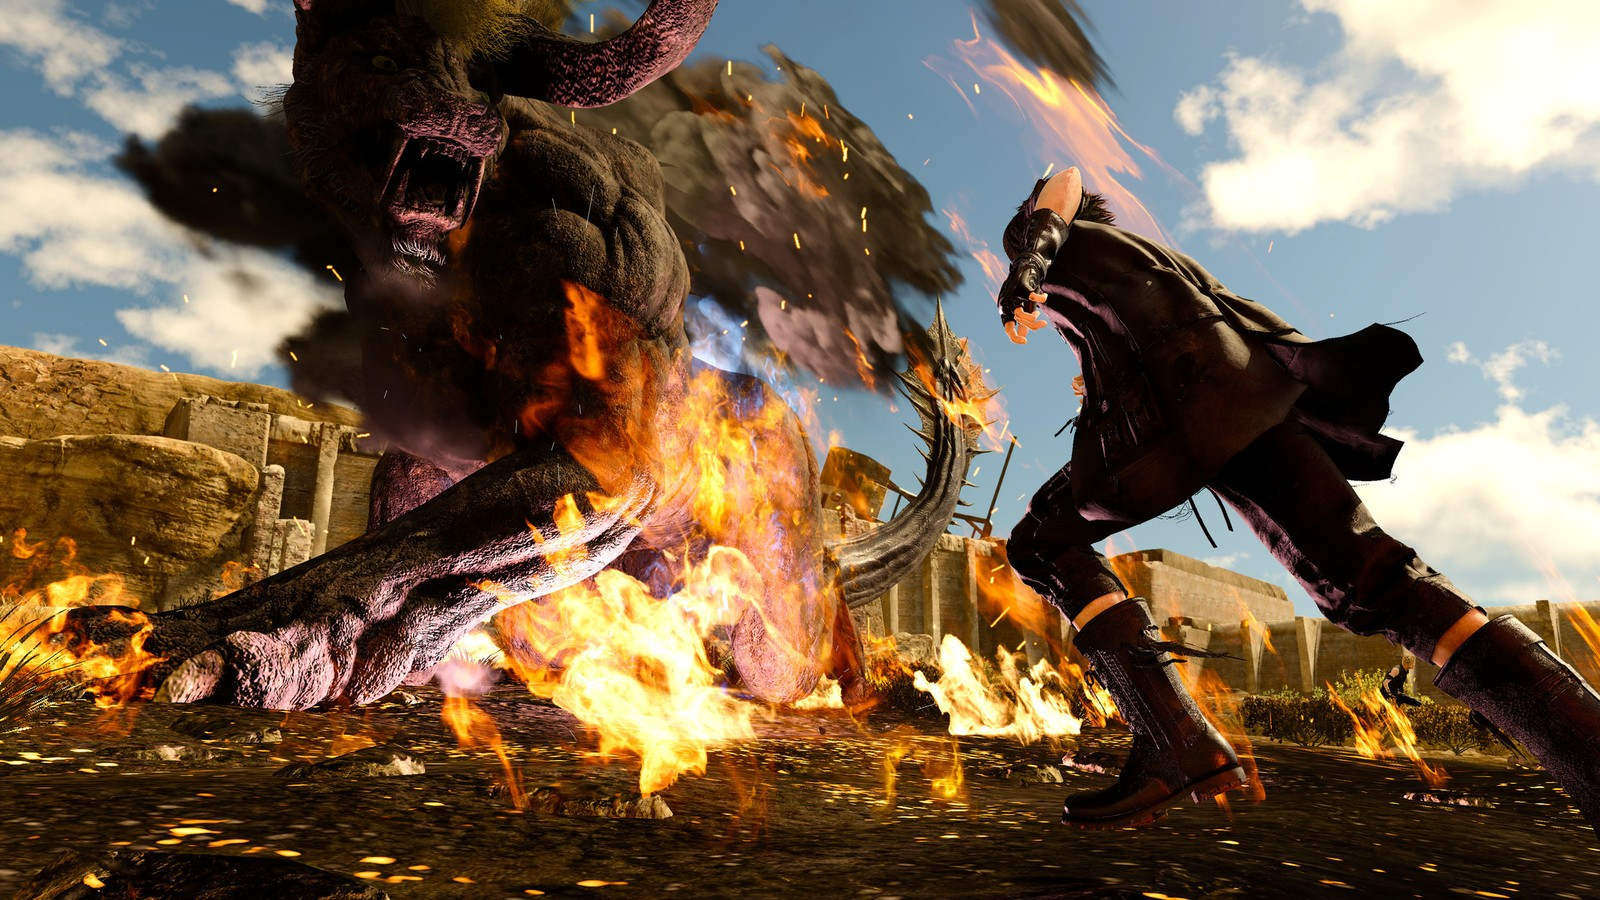 AMD Offers Up New Radeon Driver For Final Fantasy XV | Shacknews